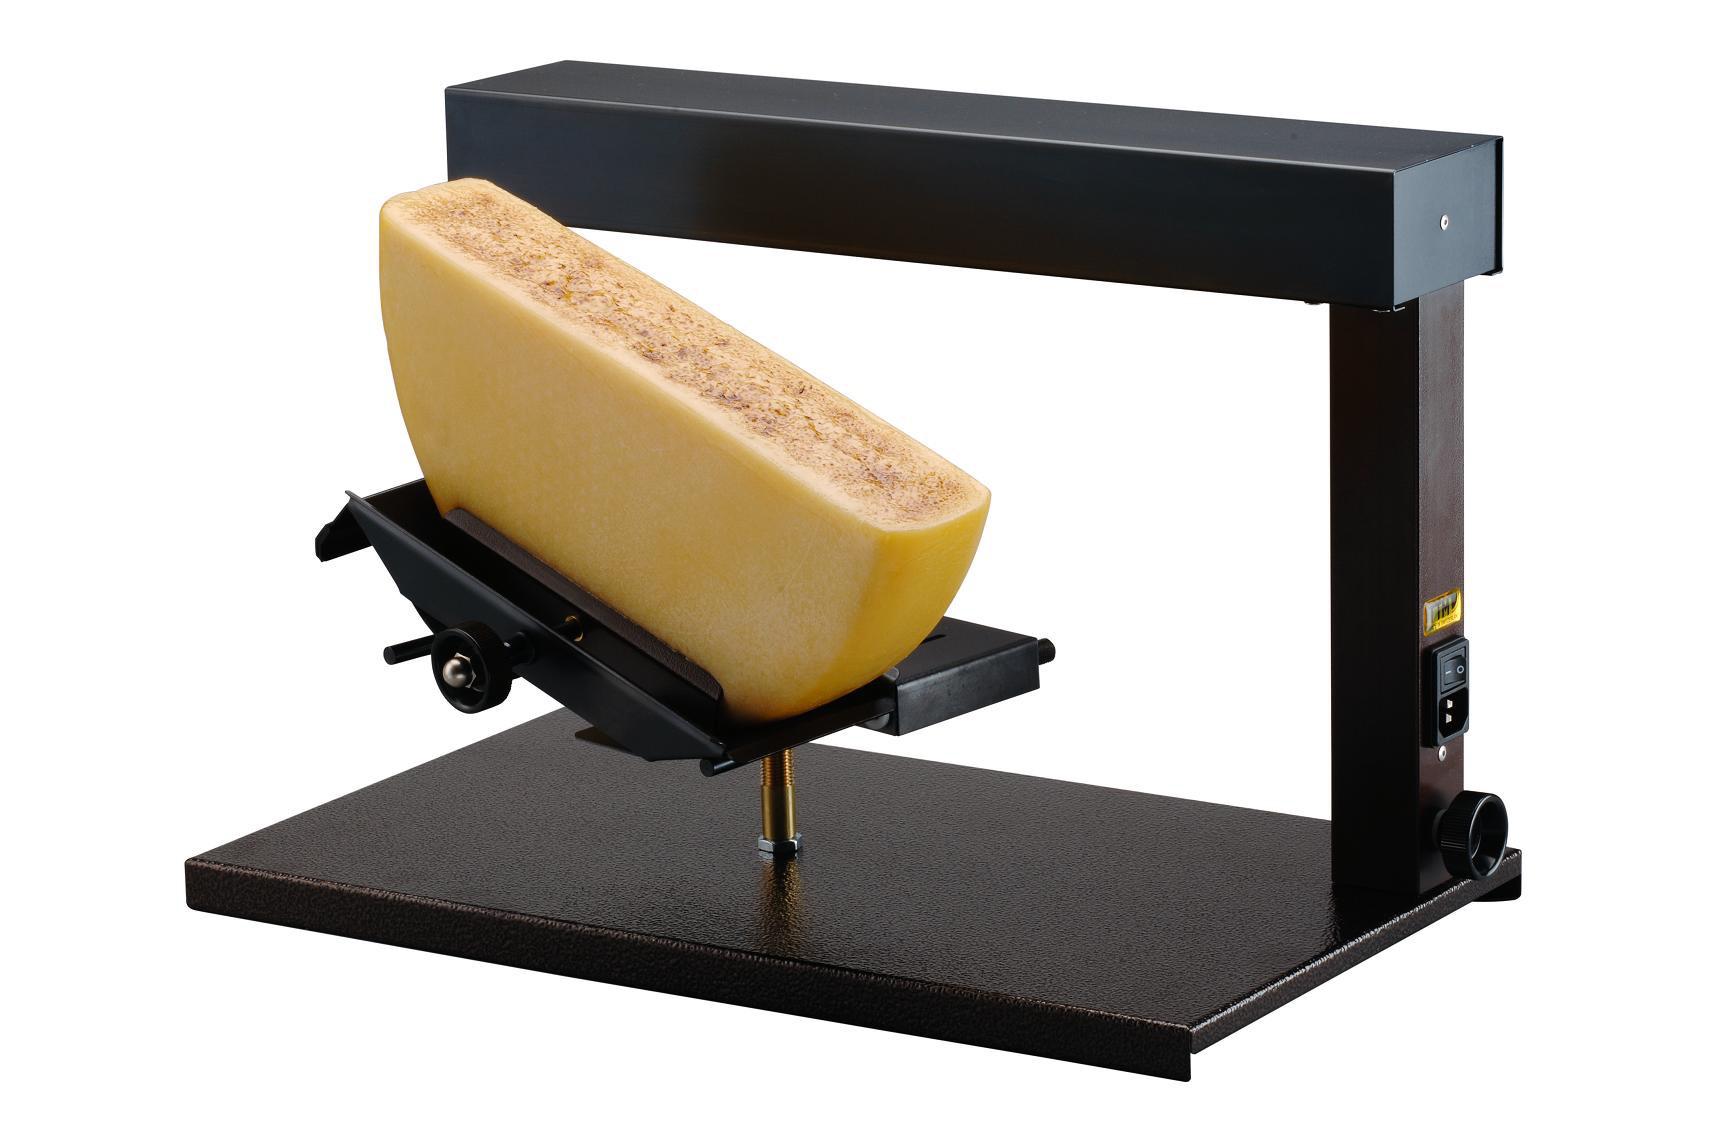 elektrische beschaltung raclette heizstab. Black Bedroom Furniture Sets. Home Design Ideas